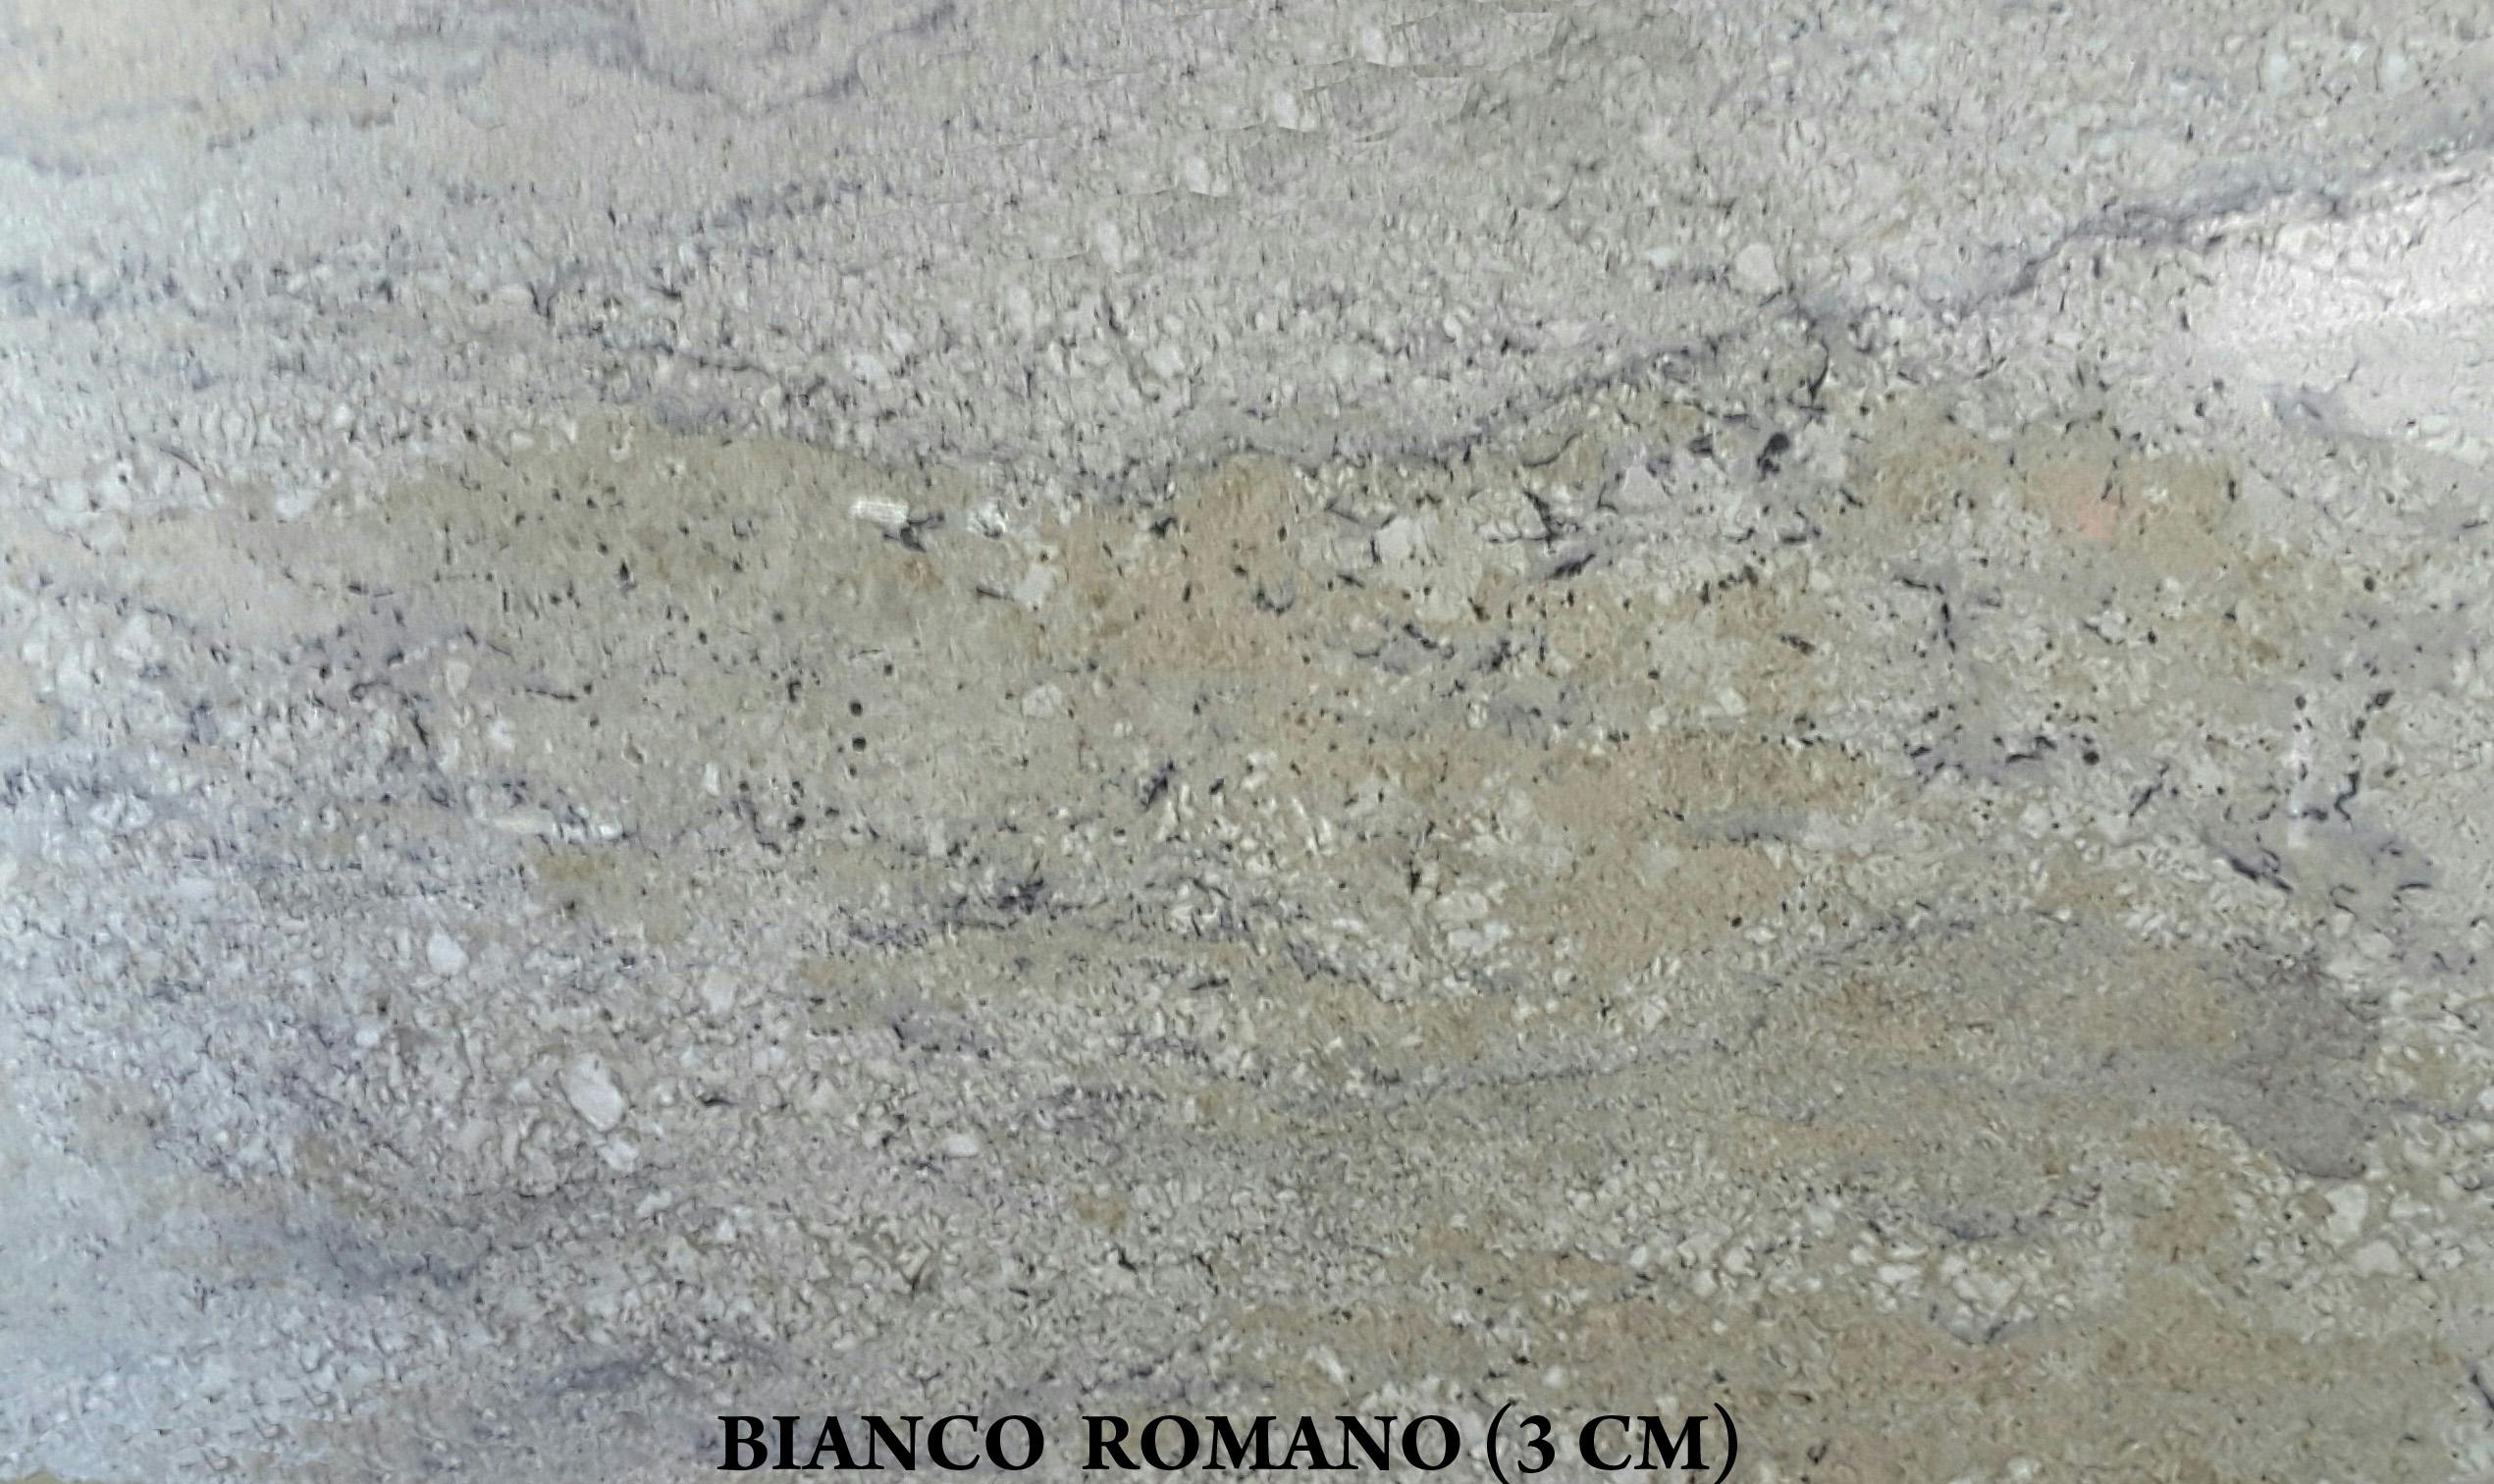 BIANCO ROMANO (3 CM)-#28938